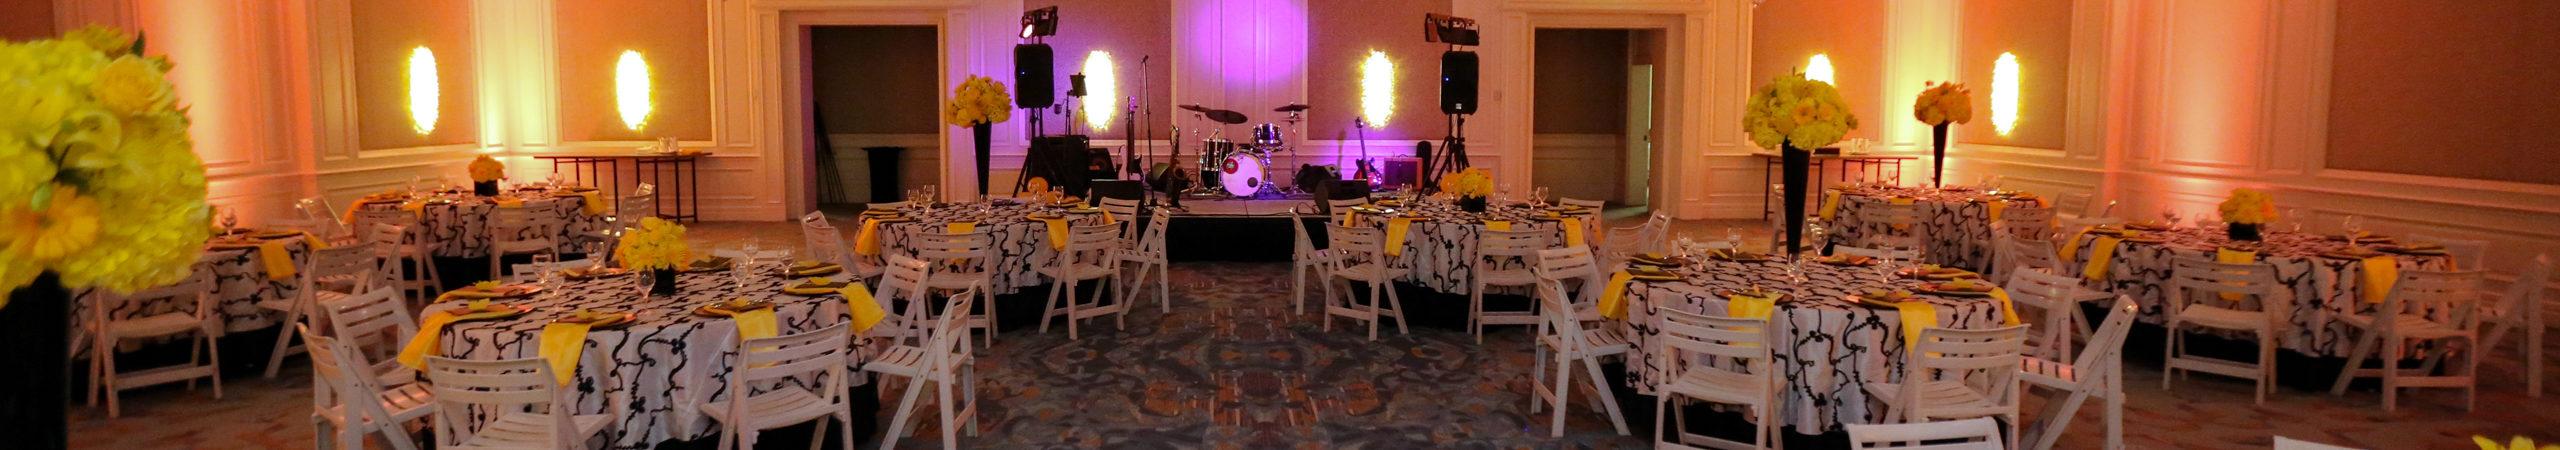 Gala at the Ritz-Carlton Amelia Island